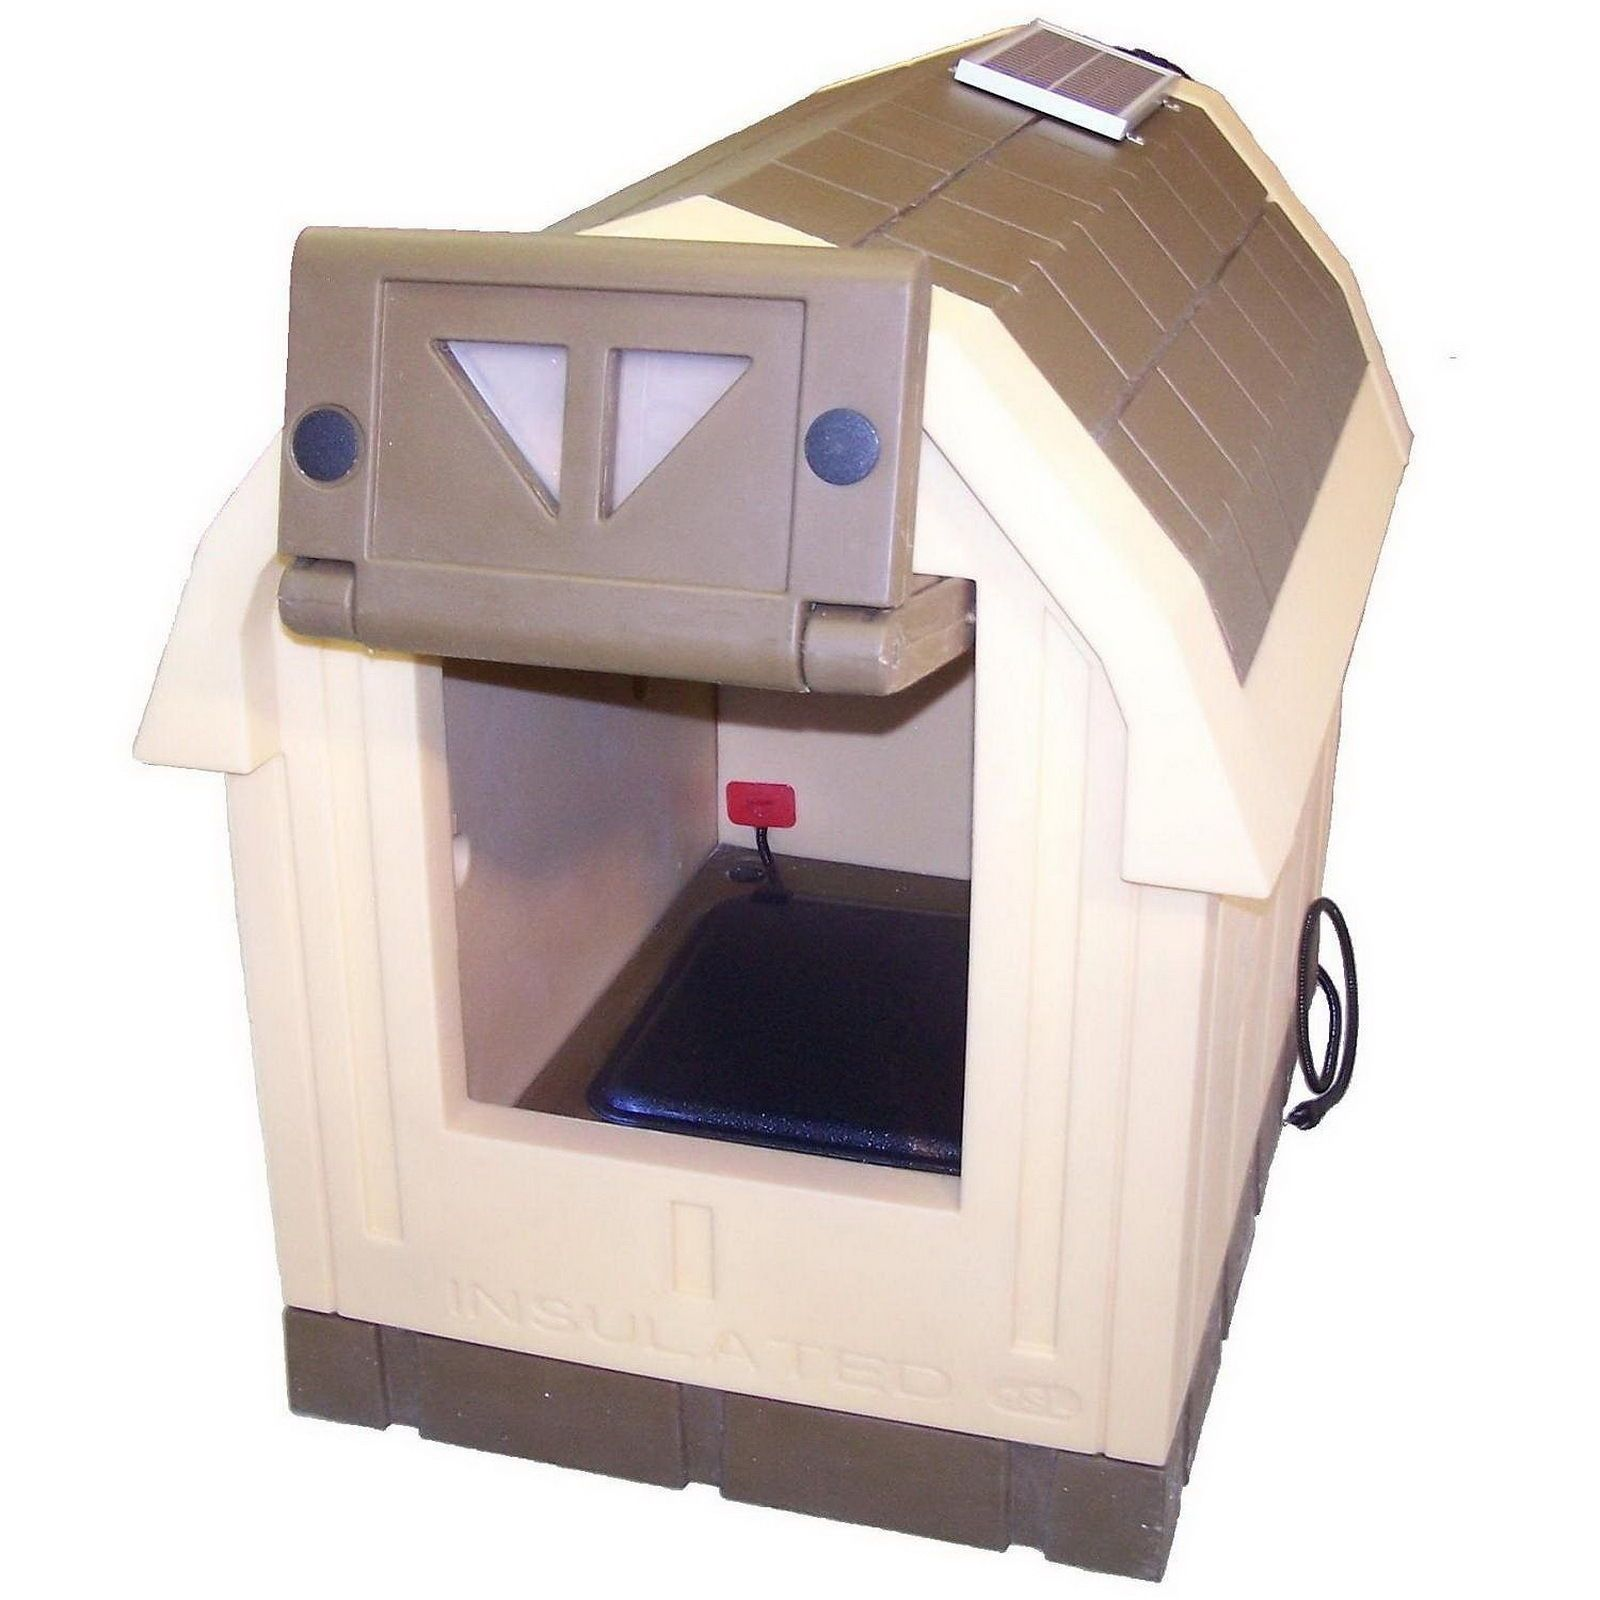 Dog House Heated Pet Friendly Pinterest Dog Houses Dog And